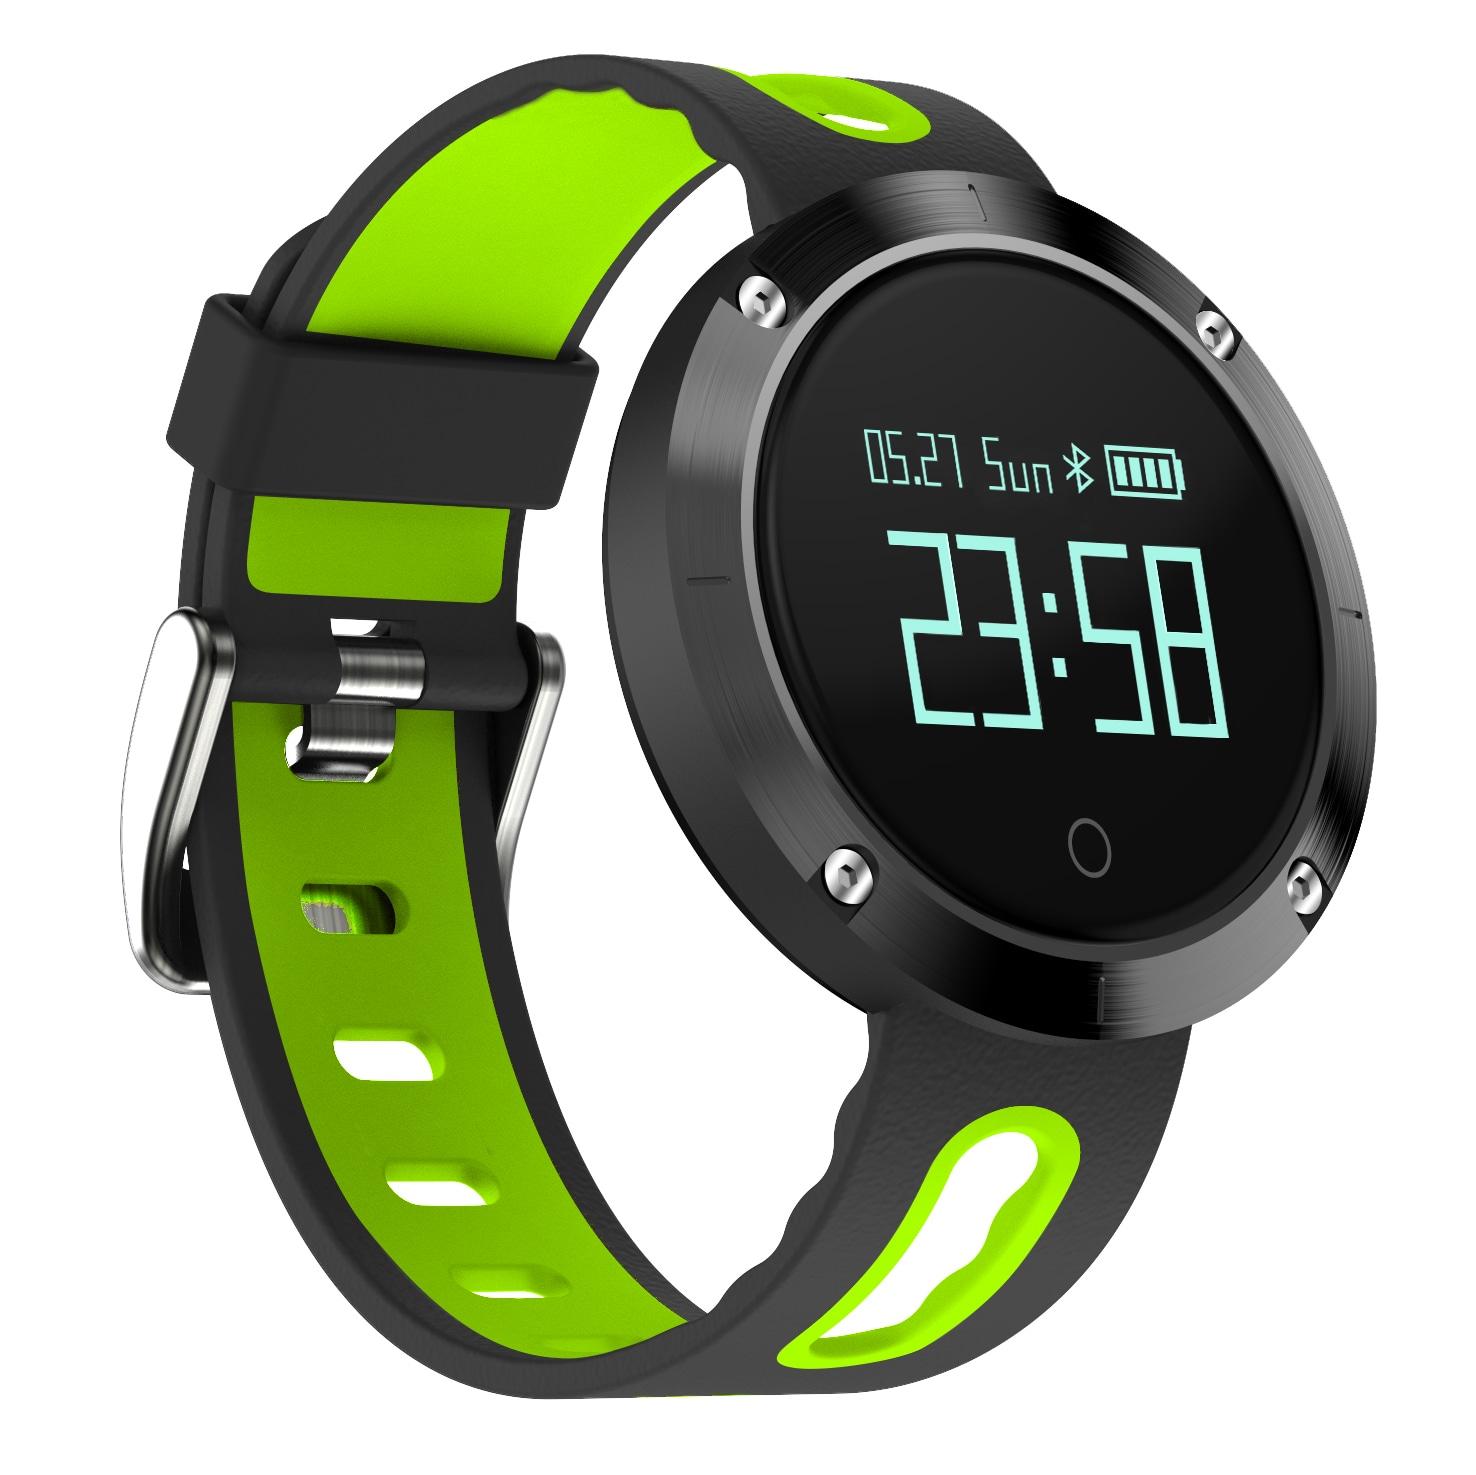 DOMINO DM58 0.95 Inch Round Display Screen Smart Bracelet Heart Rate Monitor Sport Wristband Fitness Tracker Black - 2